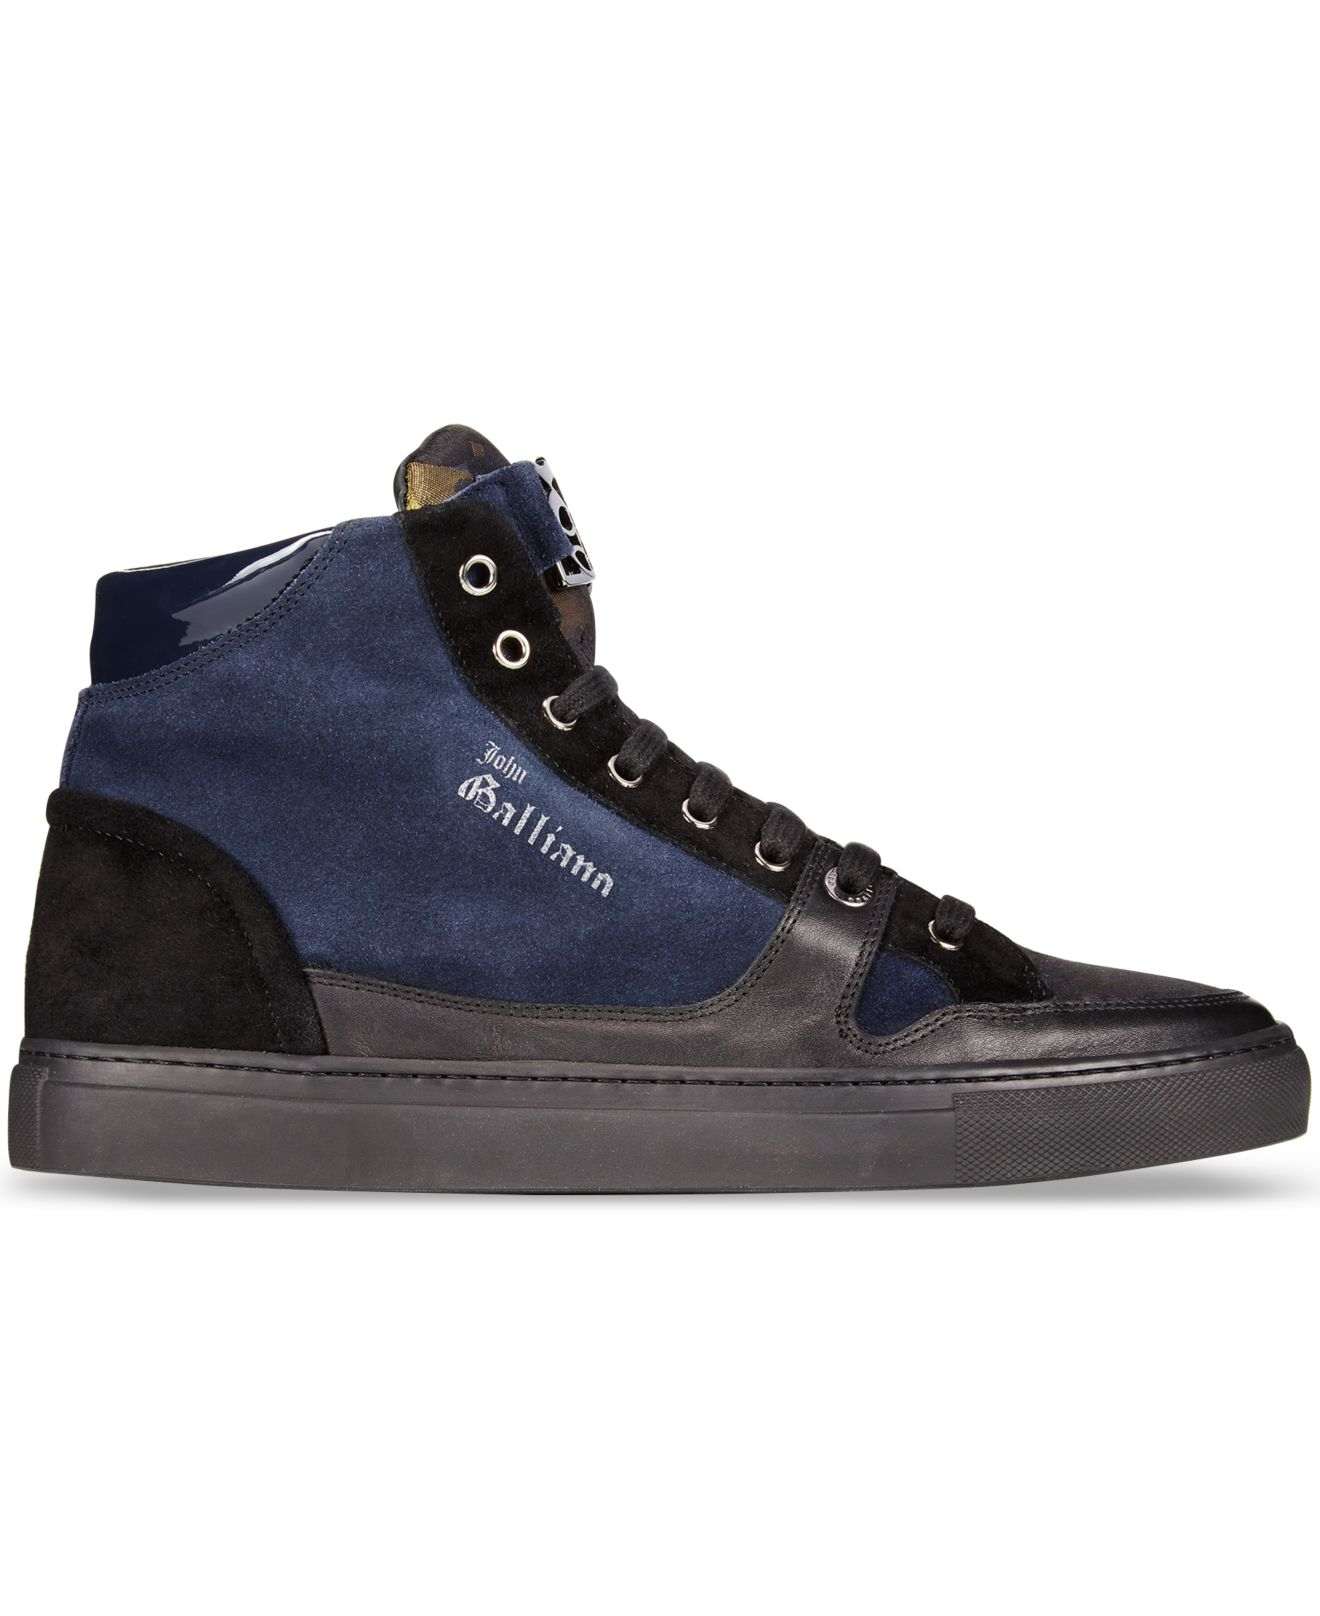 Chaussures - High-tops Et Baskets John Galliano SIKpsA